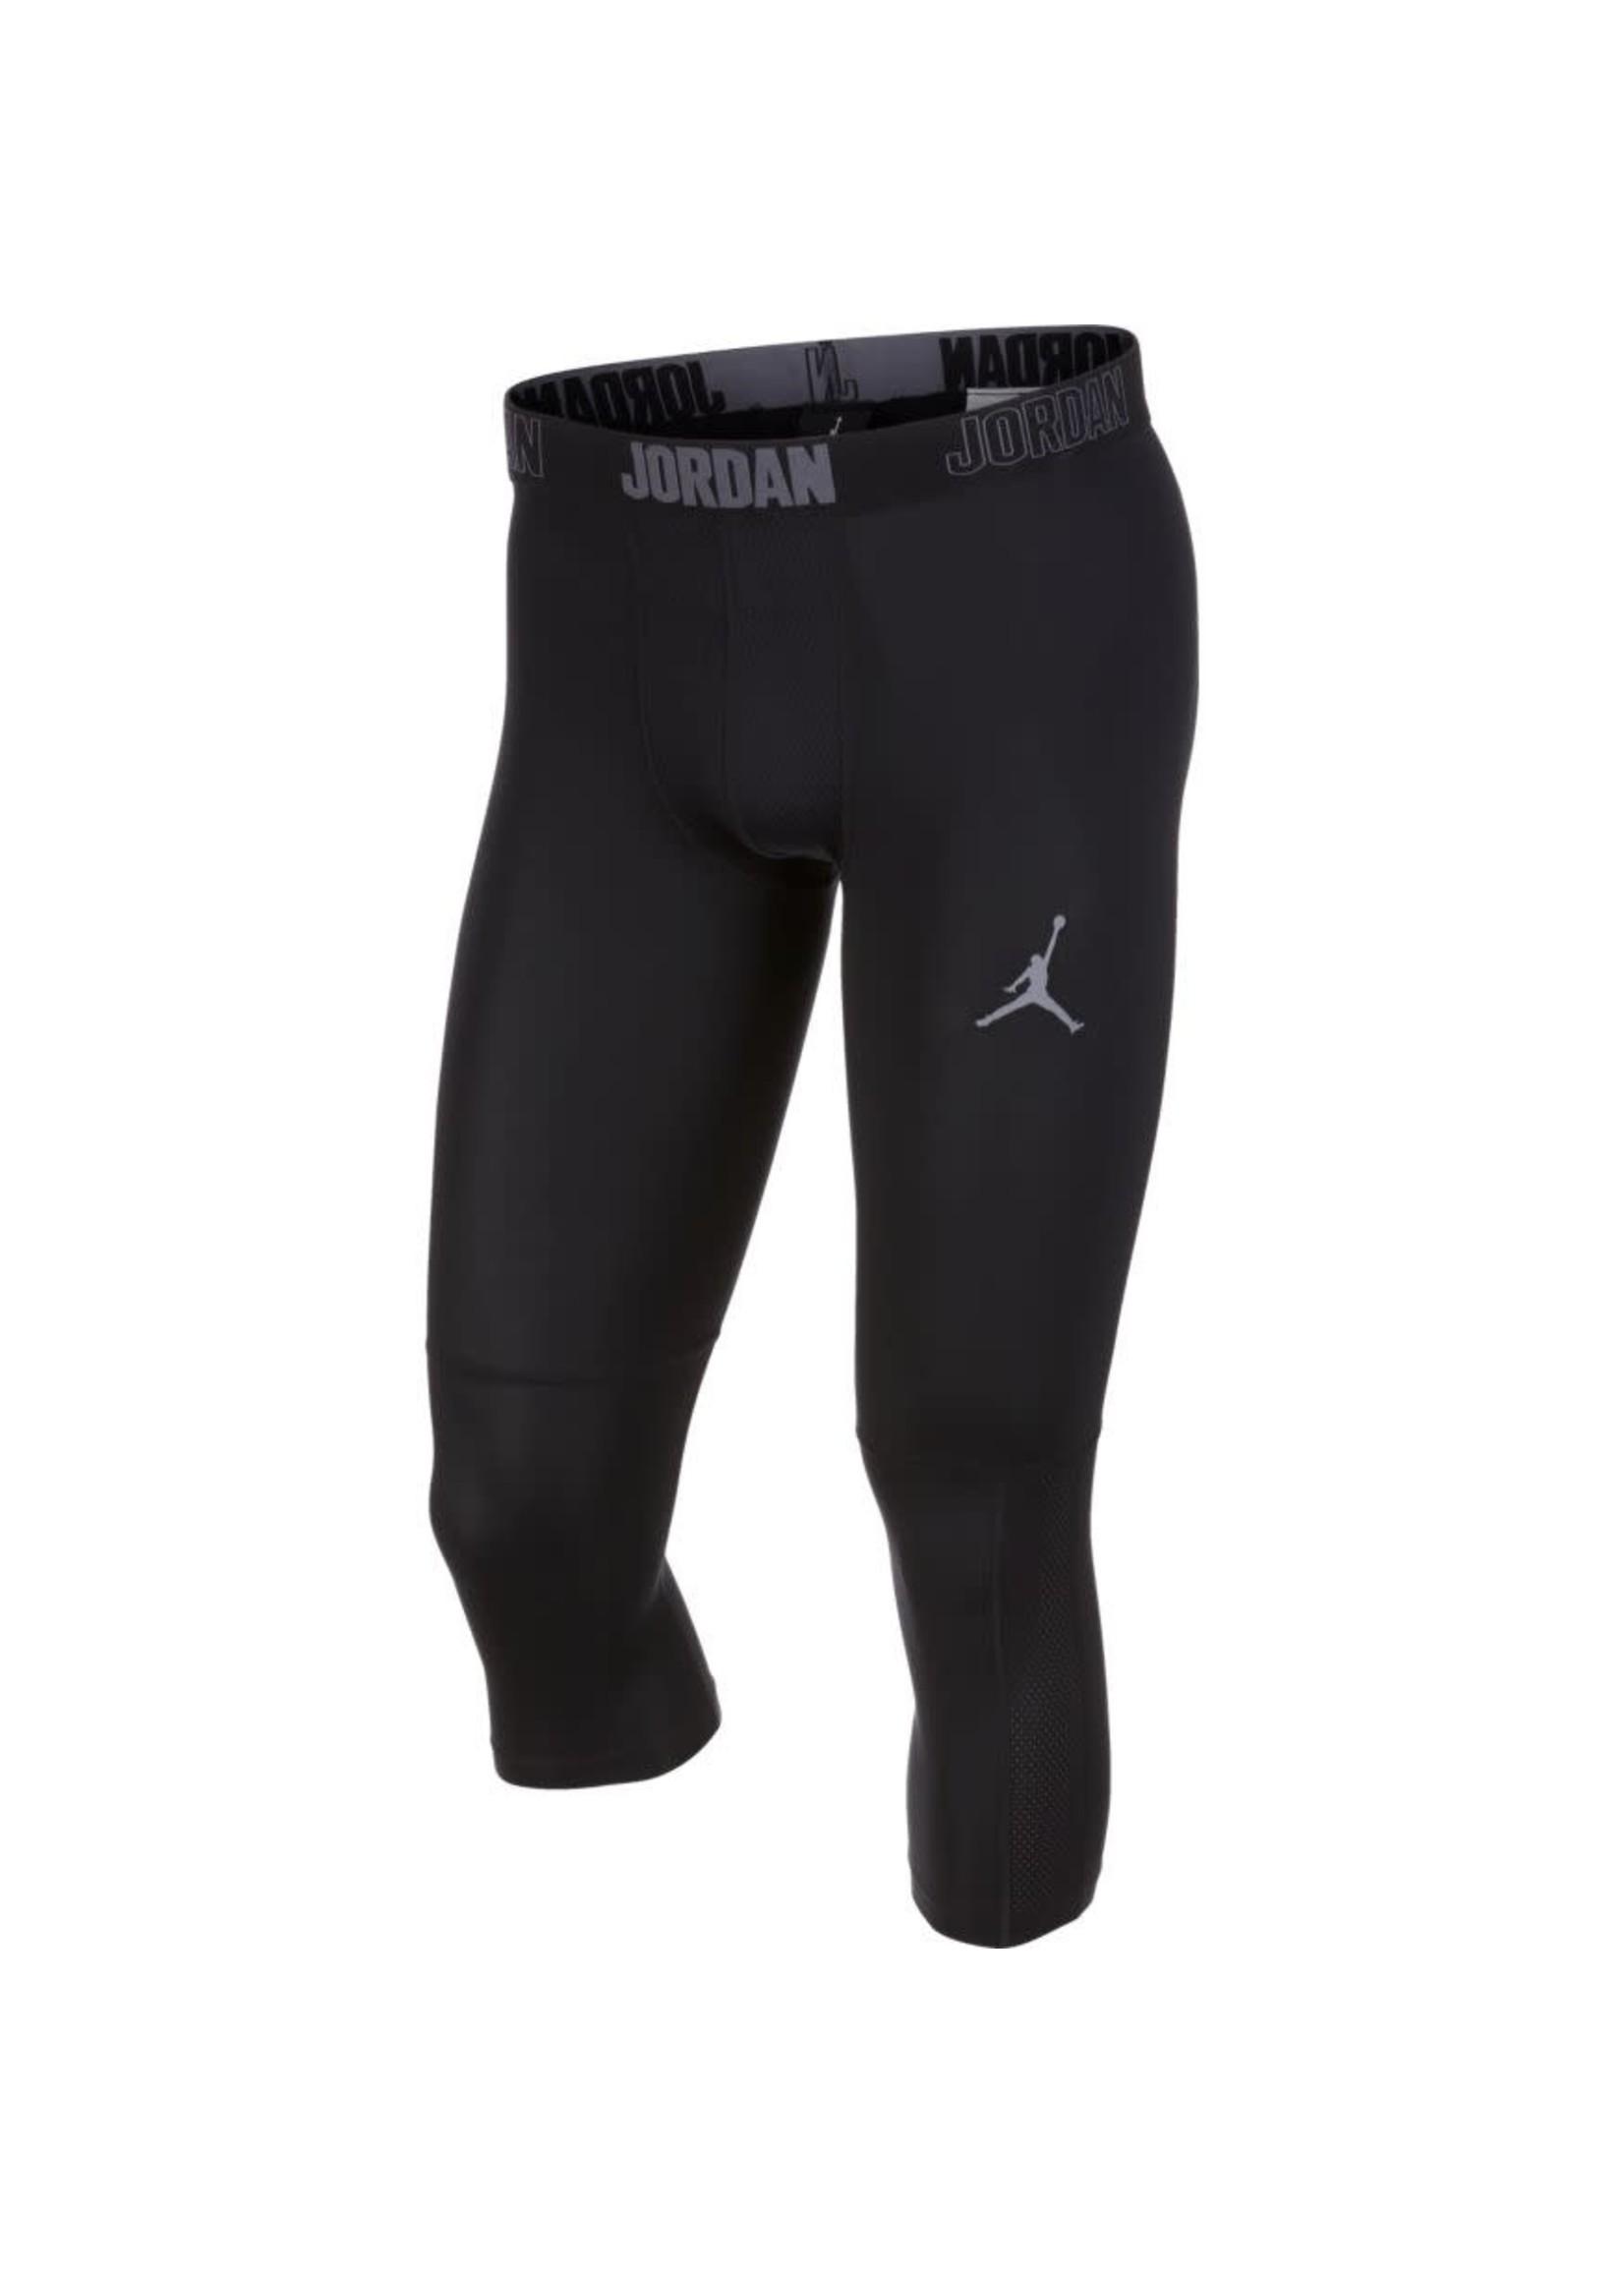 Nike Jordan 3/4 Tights